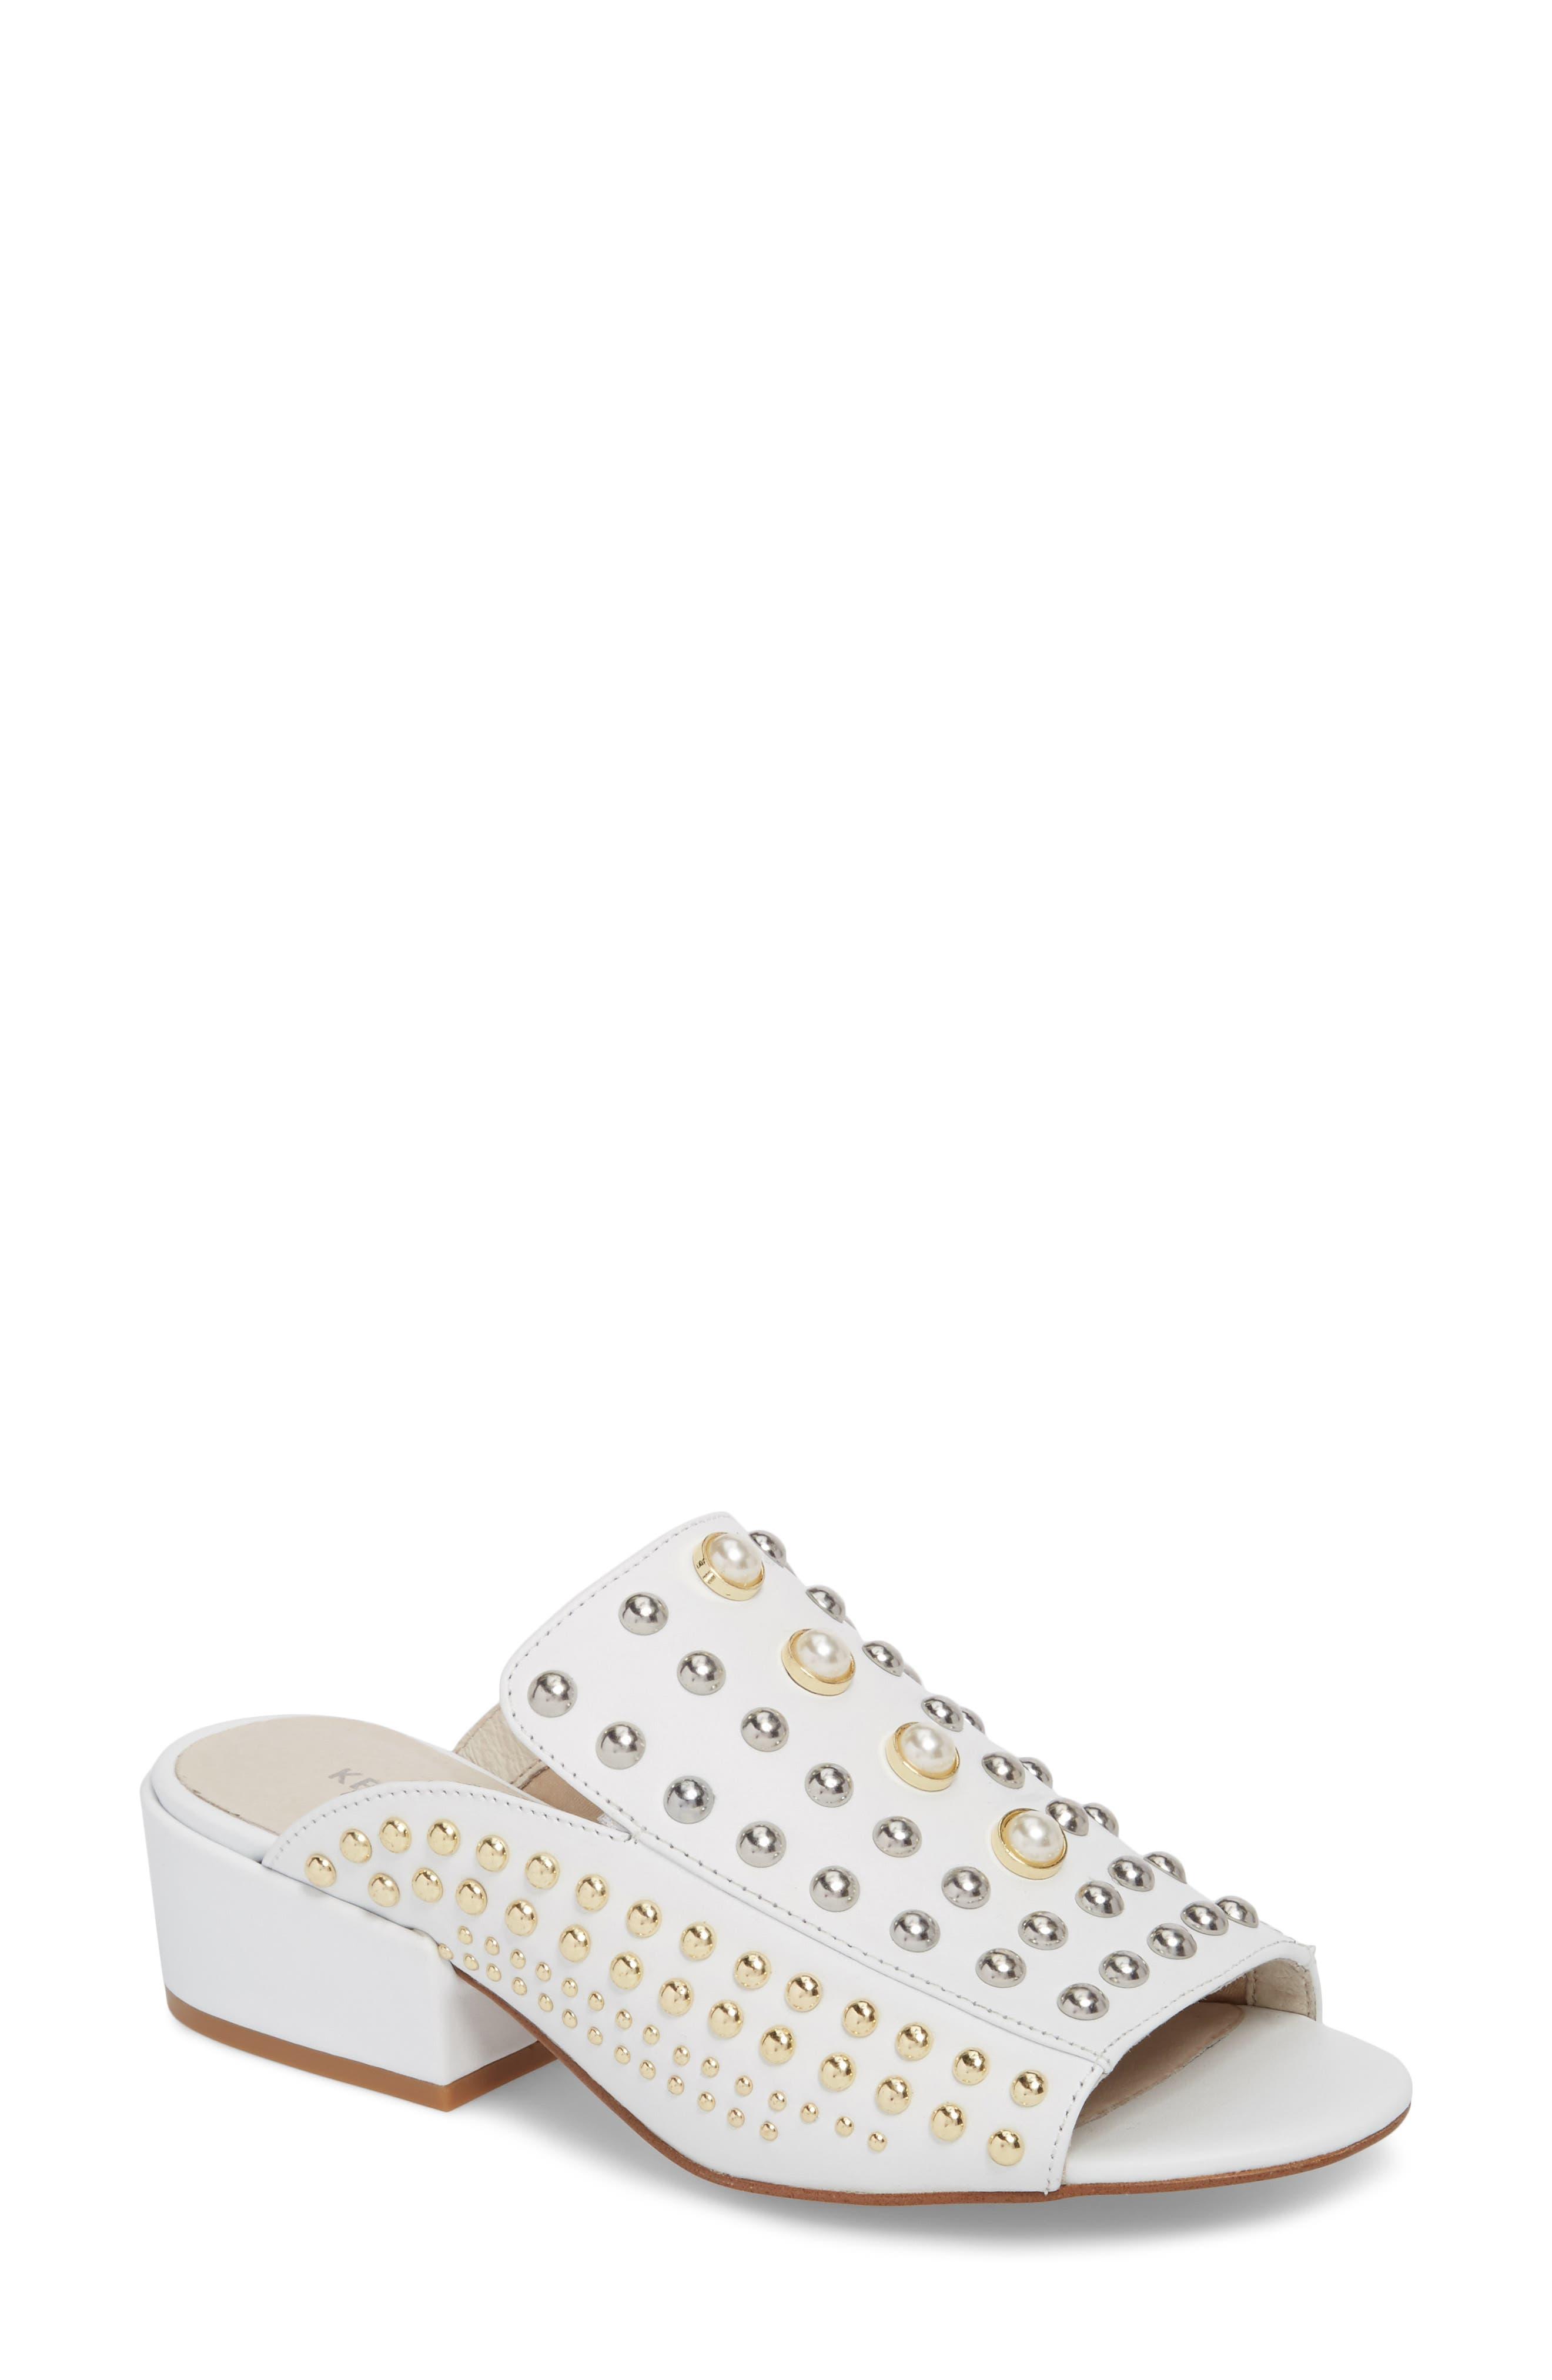 Farley Studded Slide Sandal,                             Main thumbnail 1, color,                             White Leather